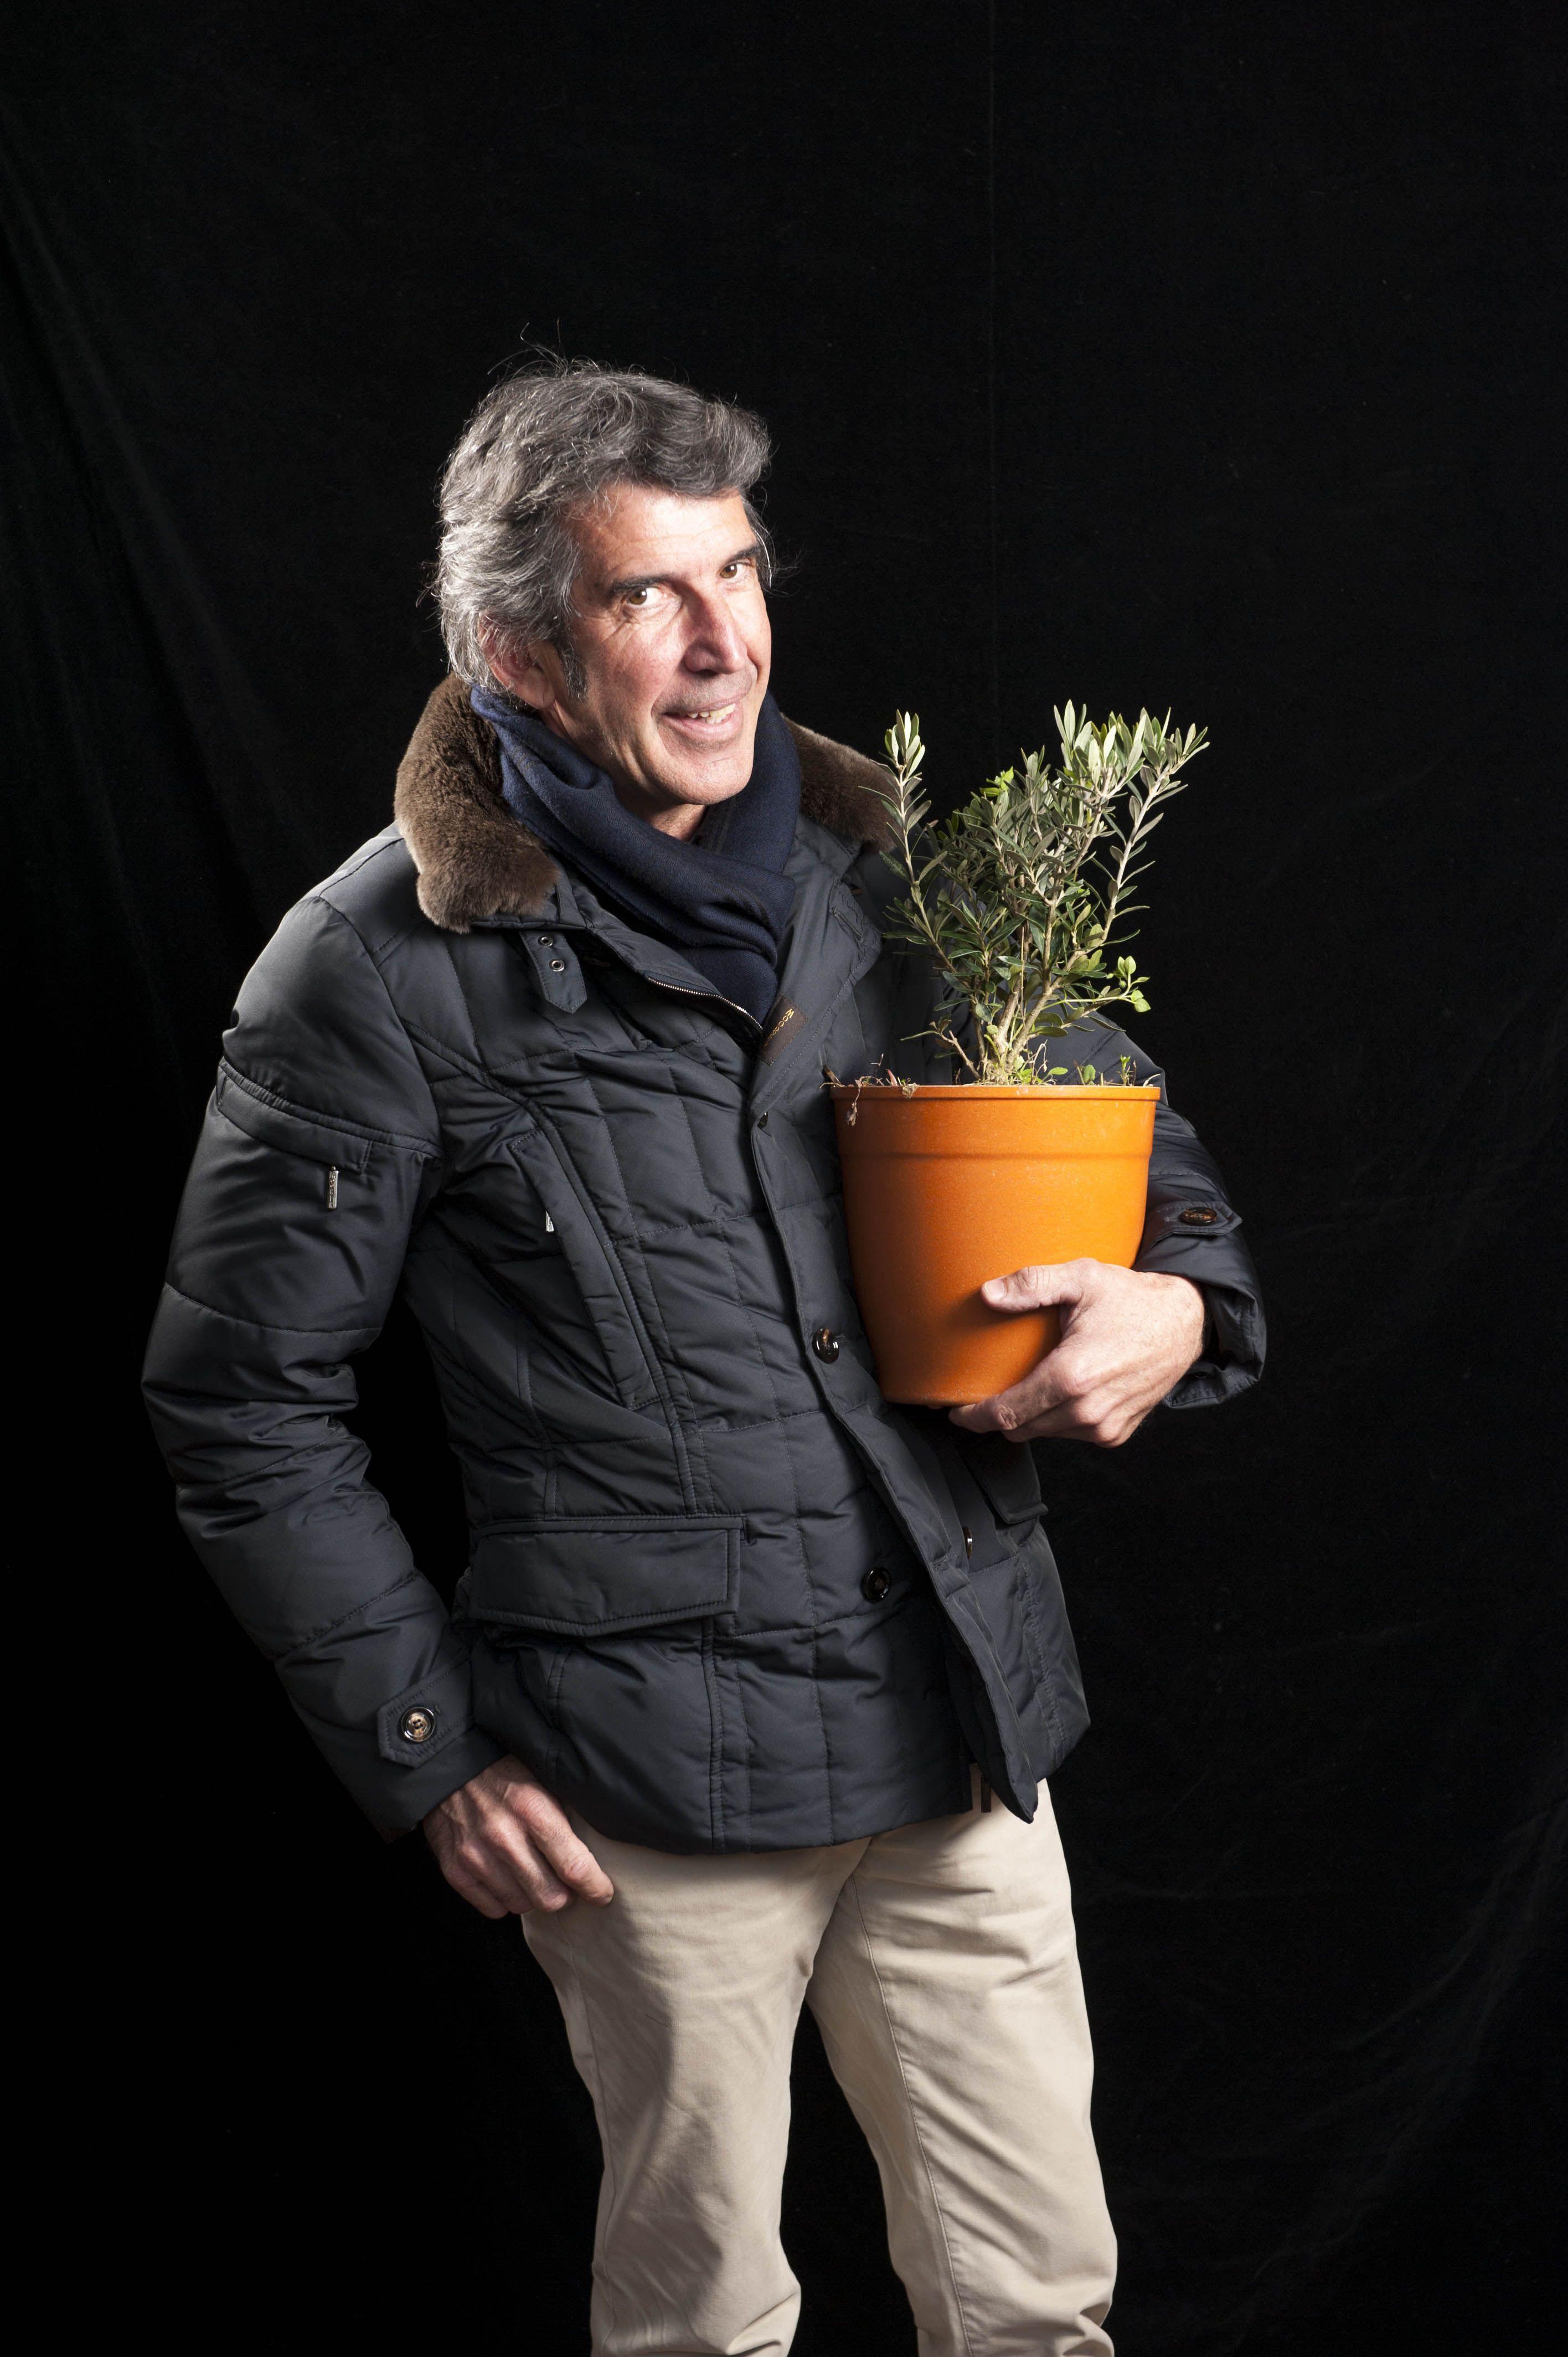 The Oil Maker: Daniele Guarneri - Azienda Agricola Gherardo Terzi